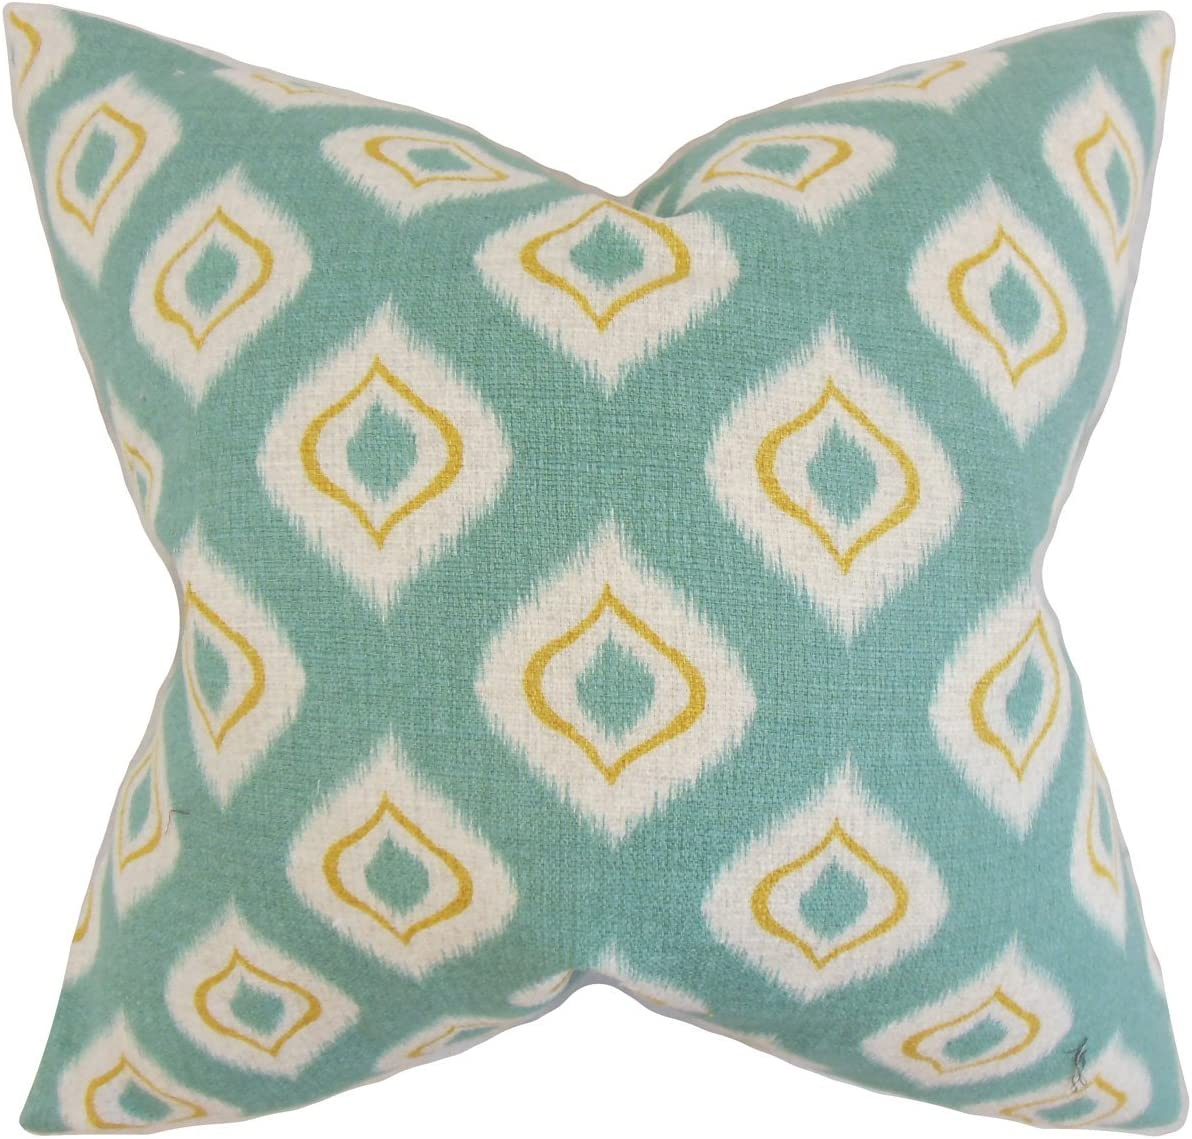 The Pillow Collection Dai Ikat Bedding Sham Aqua Queen//20 x 30